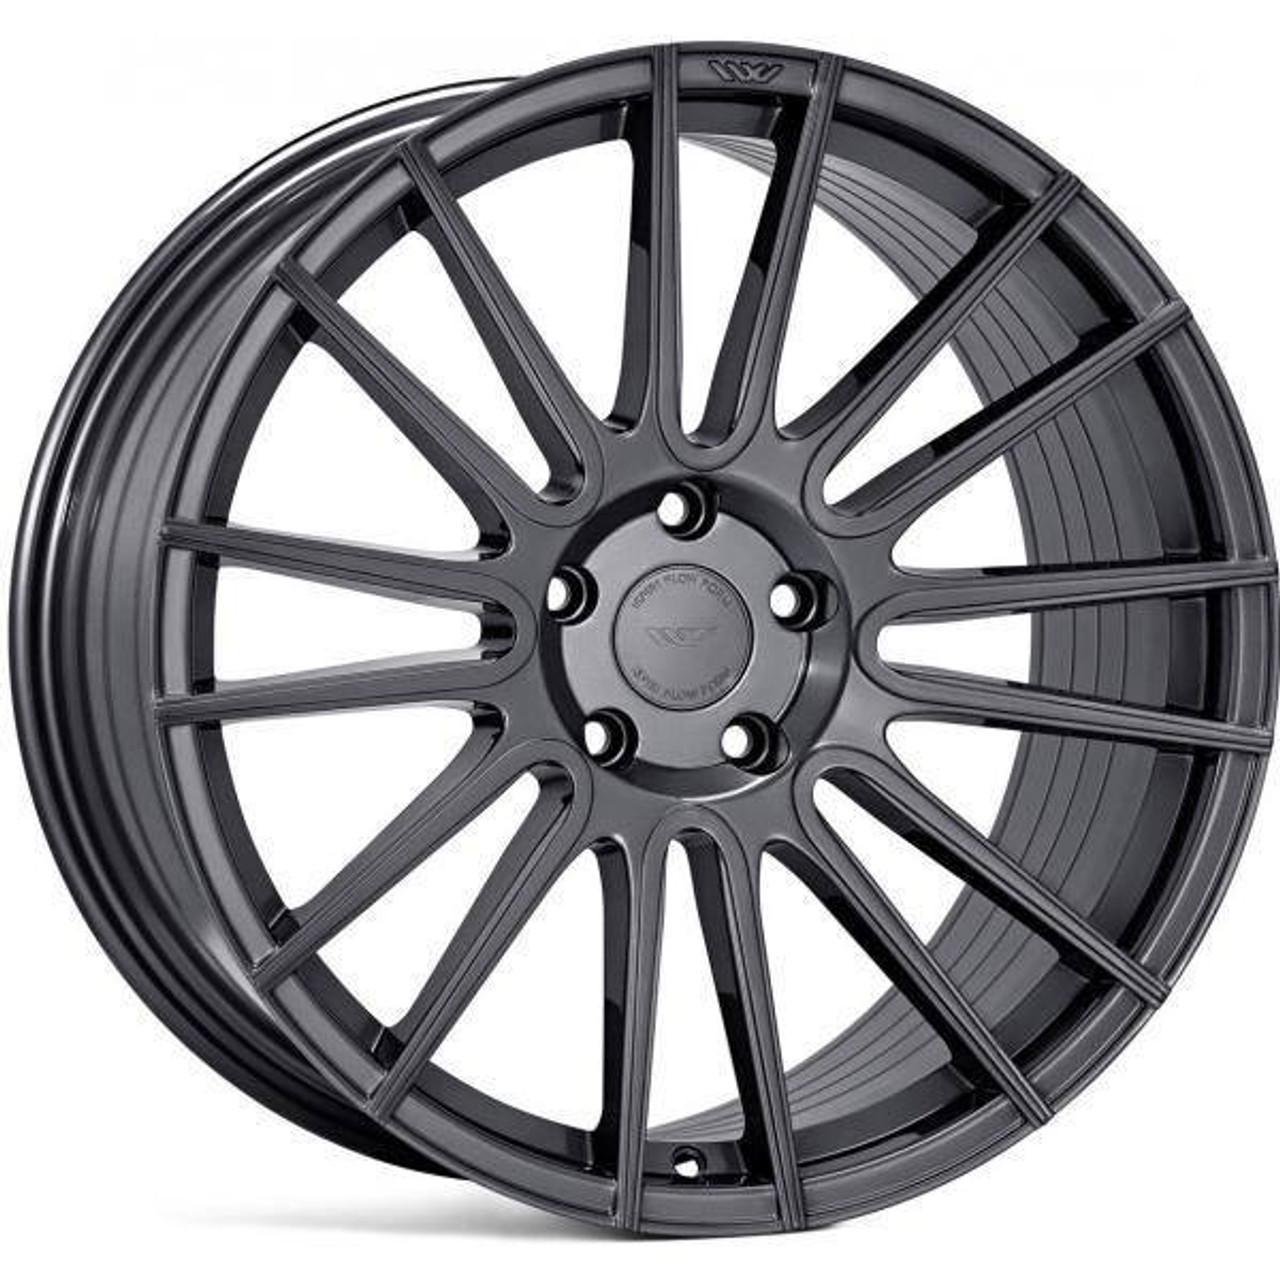 Ispiri FFR8 Alloy Wheels Carbon Graphite